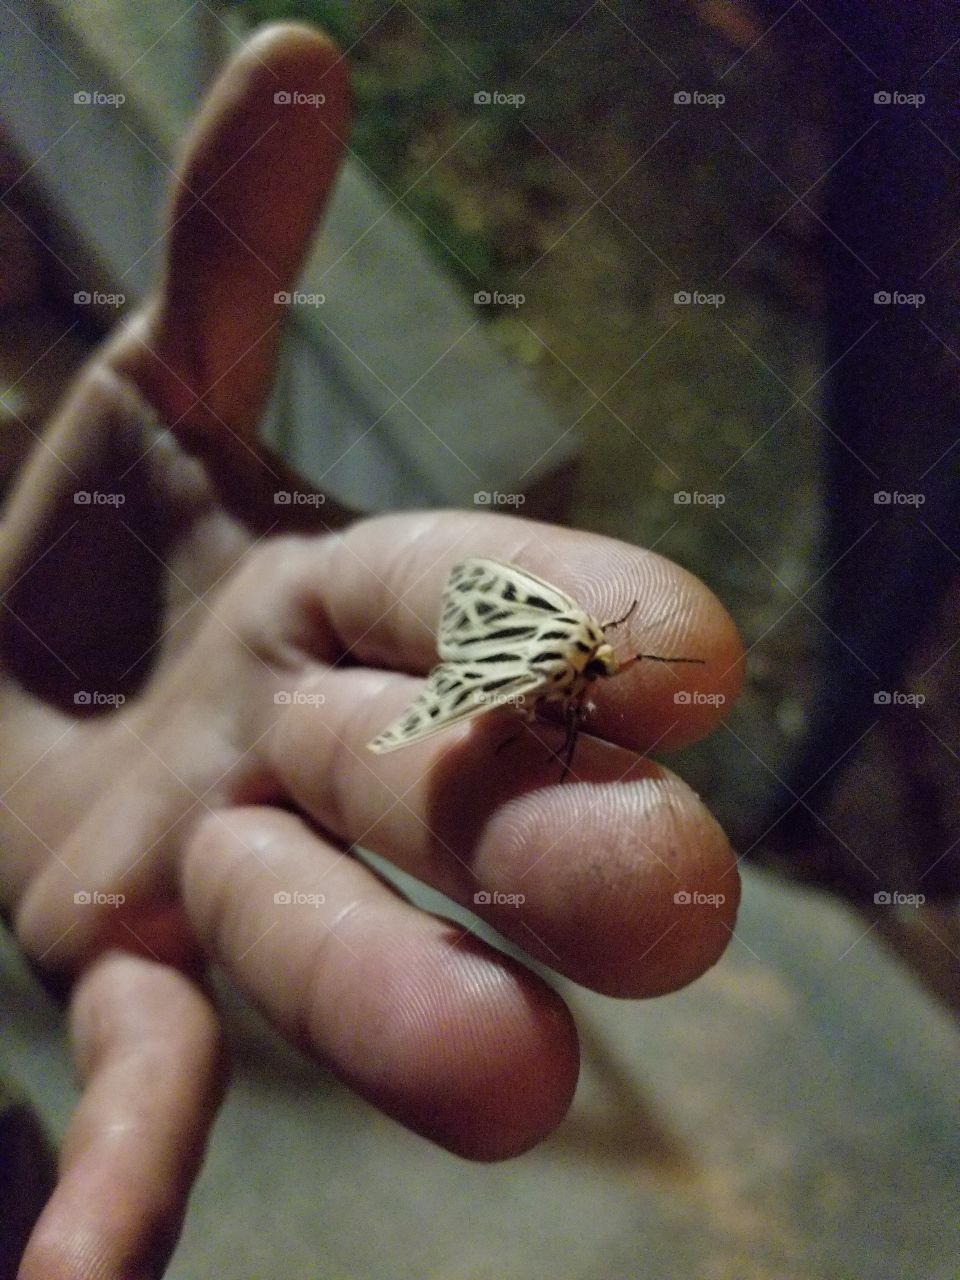 Moth on hand